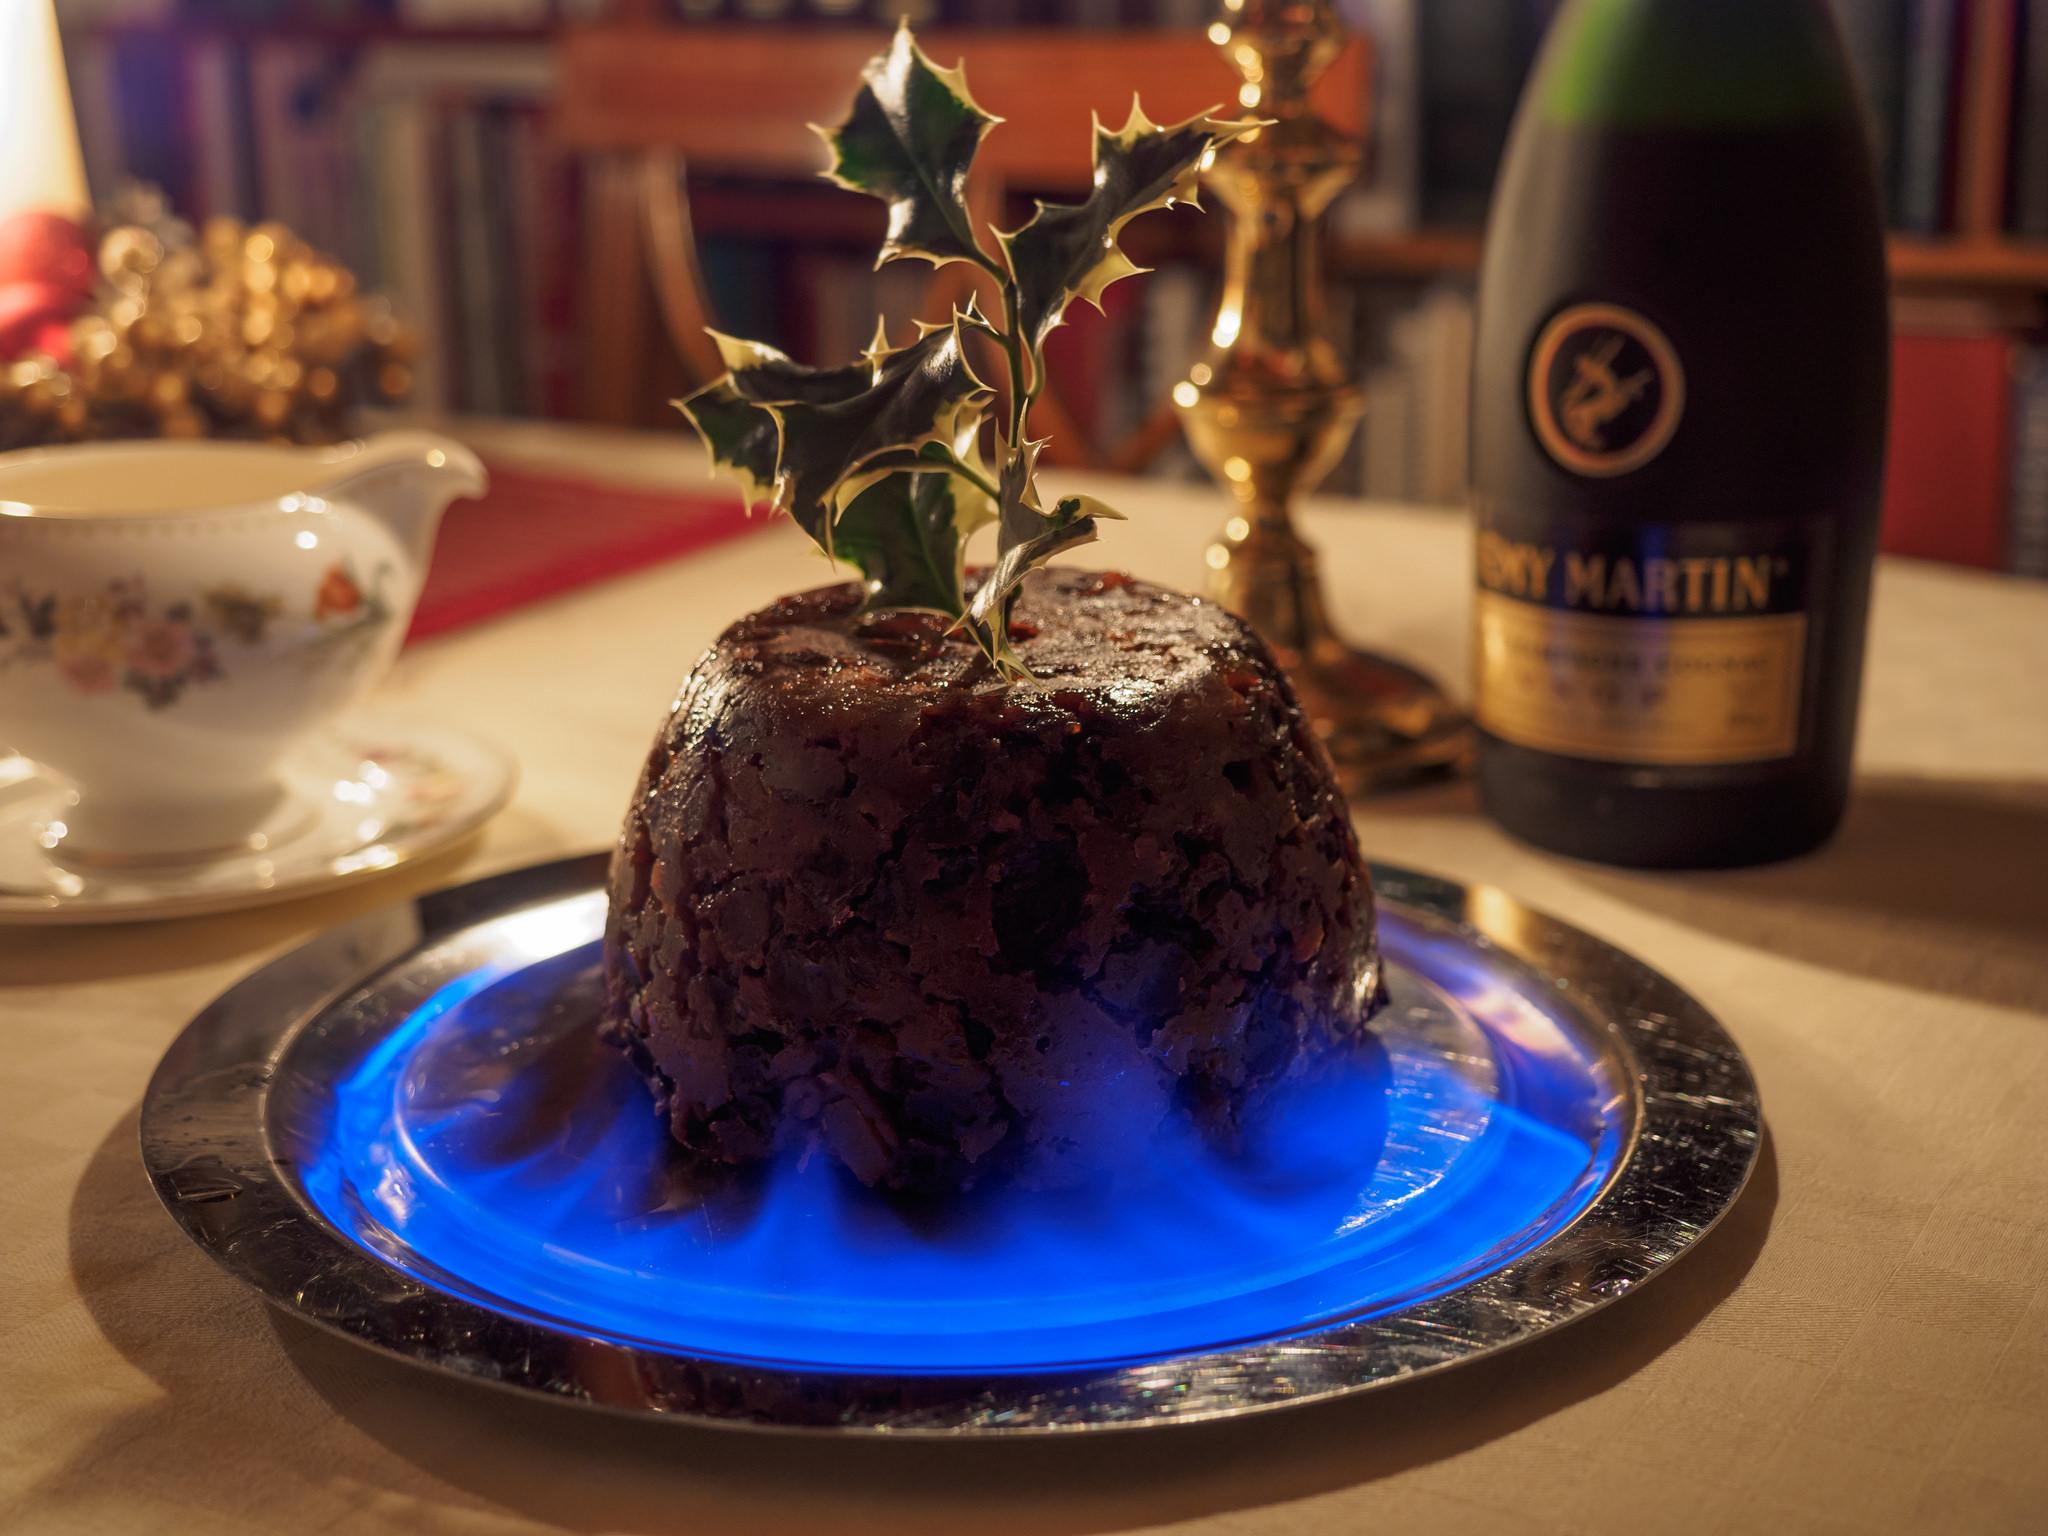 What kind of food do ireland eat on christmas